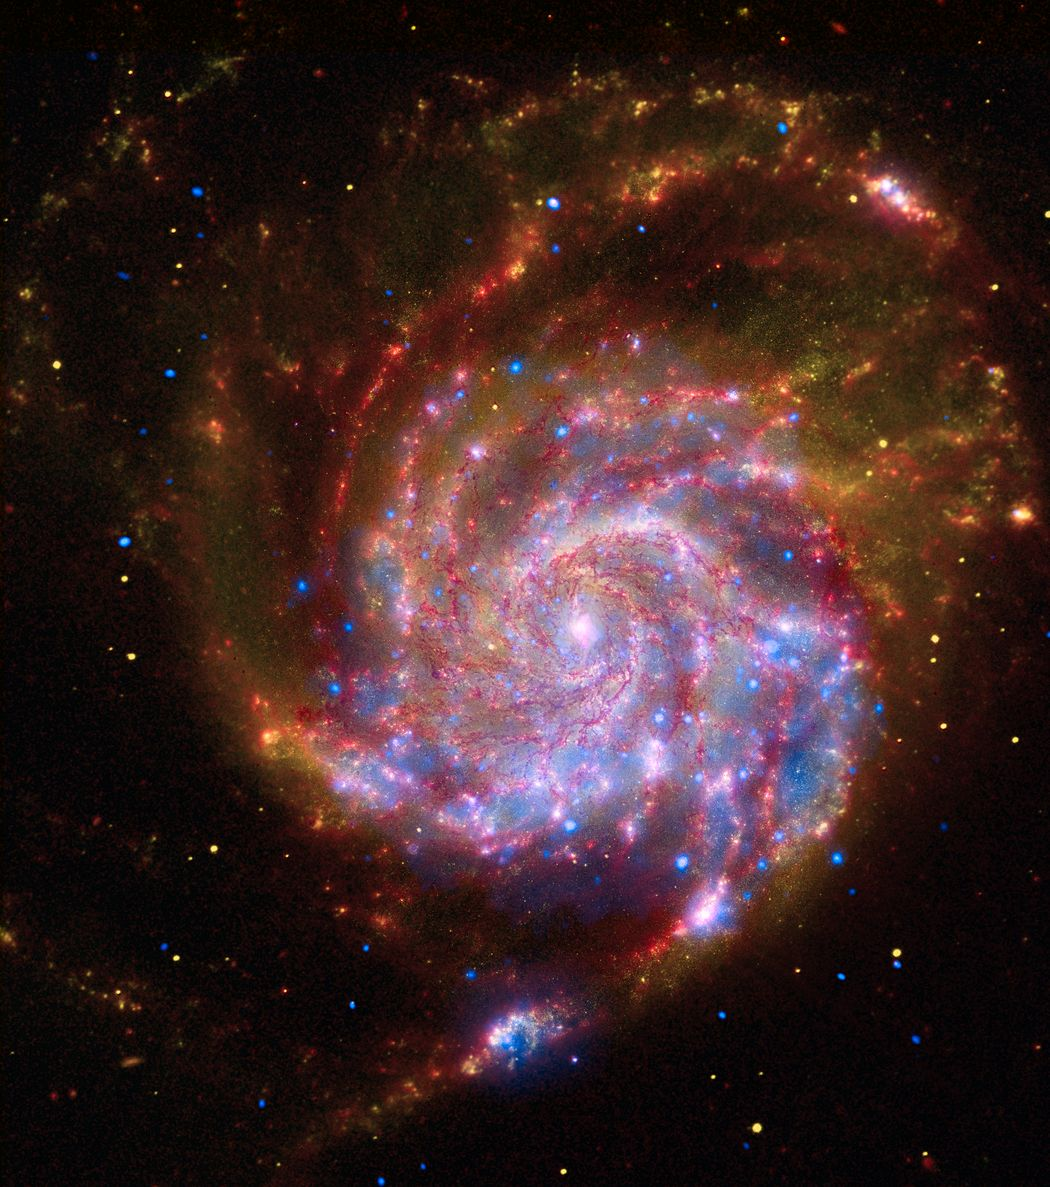 Universo Mágico: M101 por Chandra Hubble y Spitzer